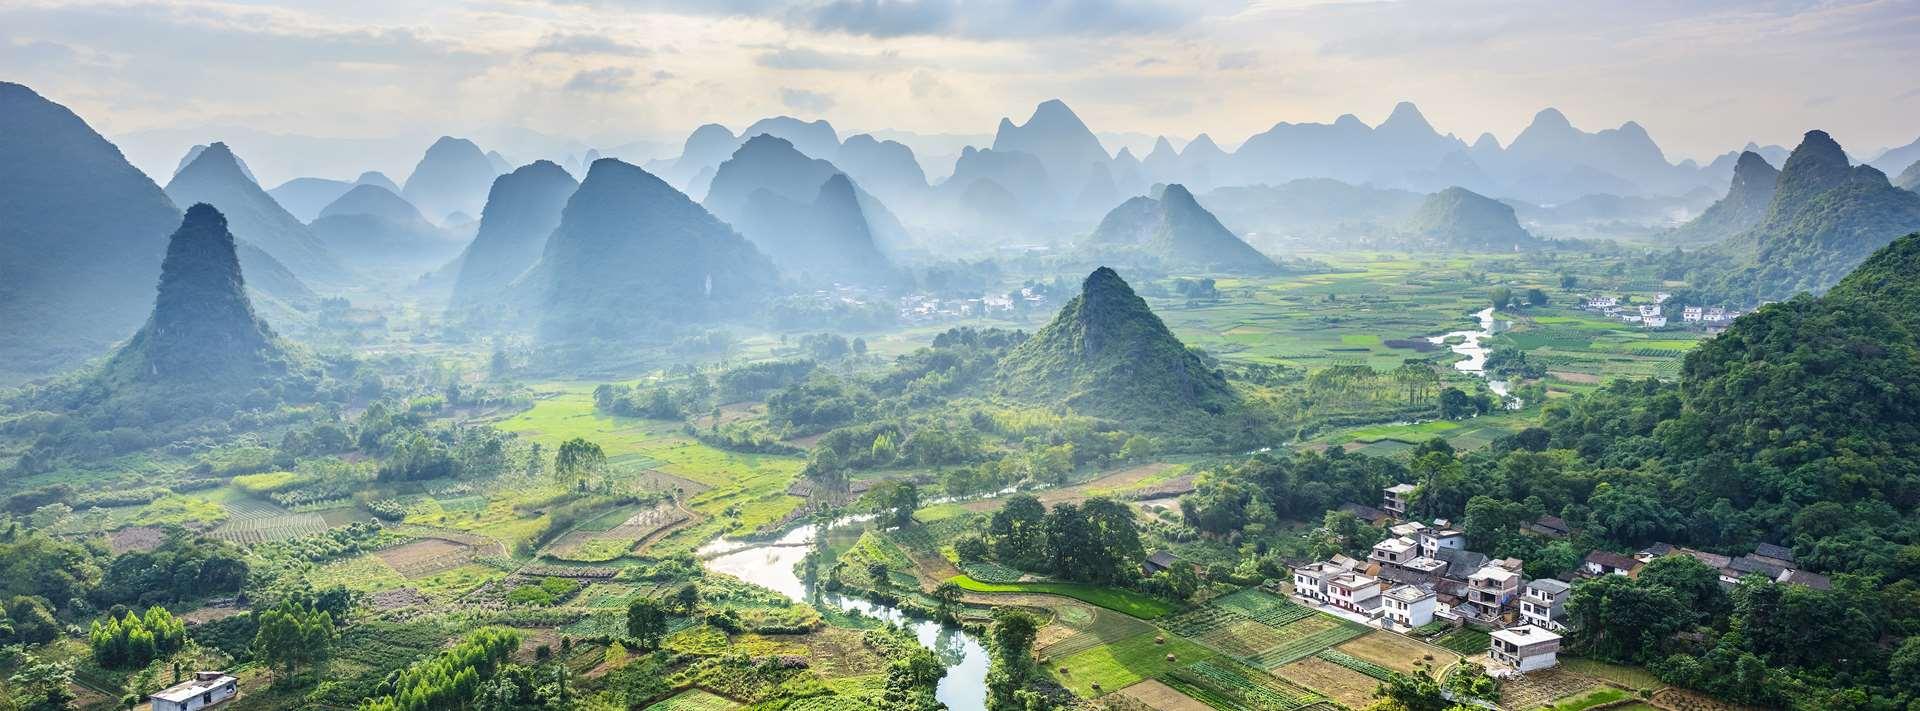 Cheap flights to Yanji from #### | Netflights